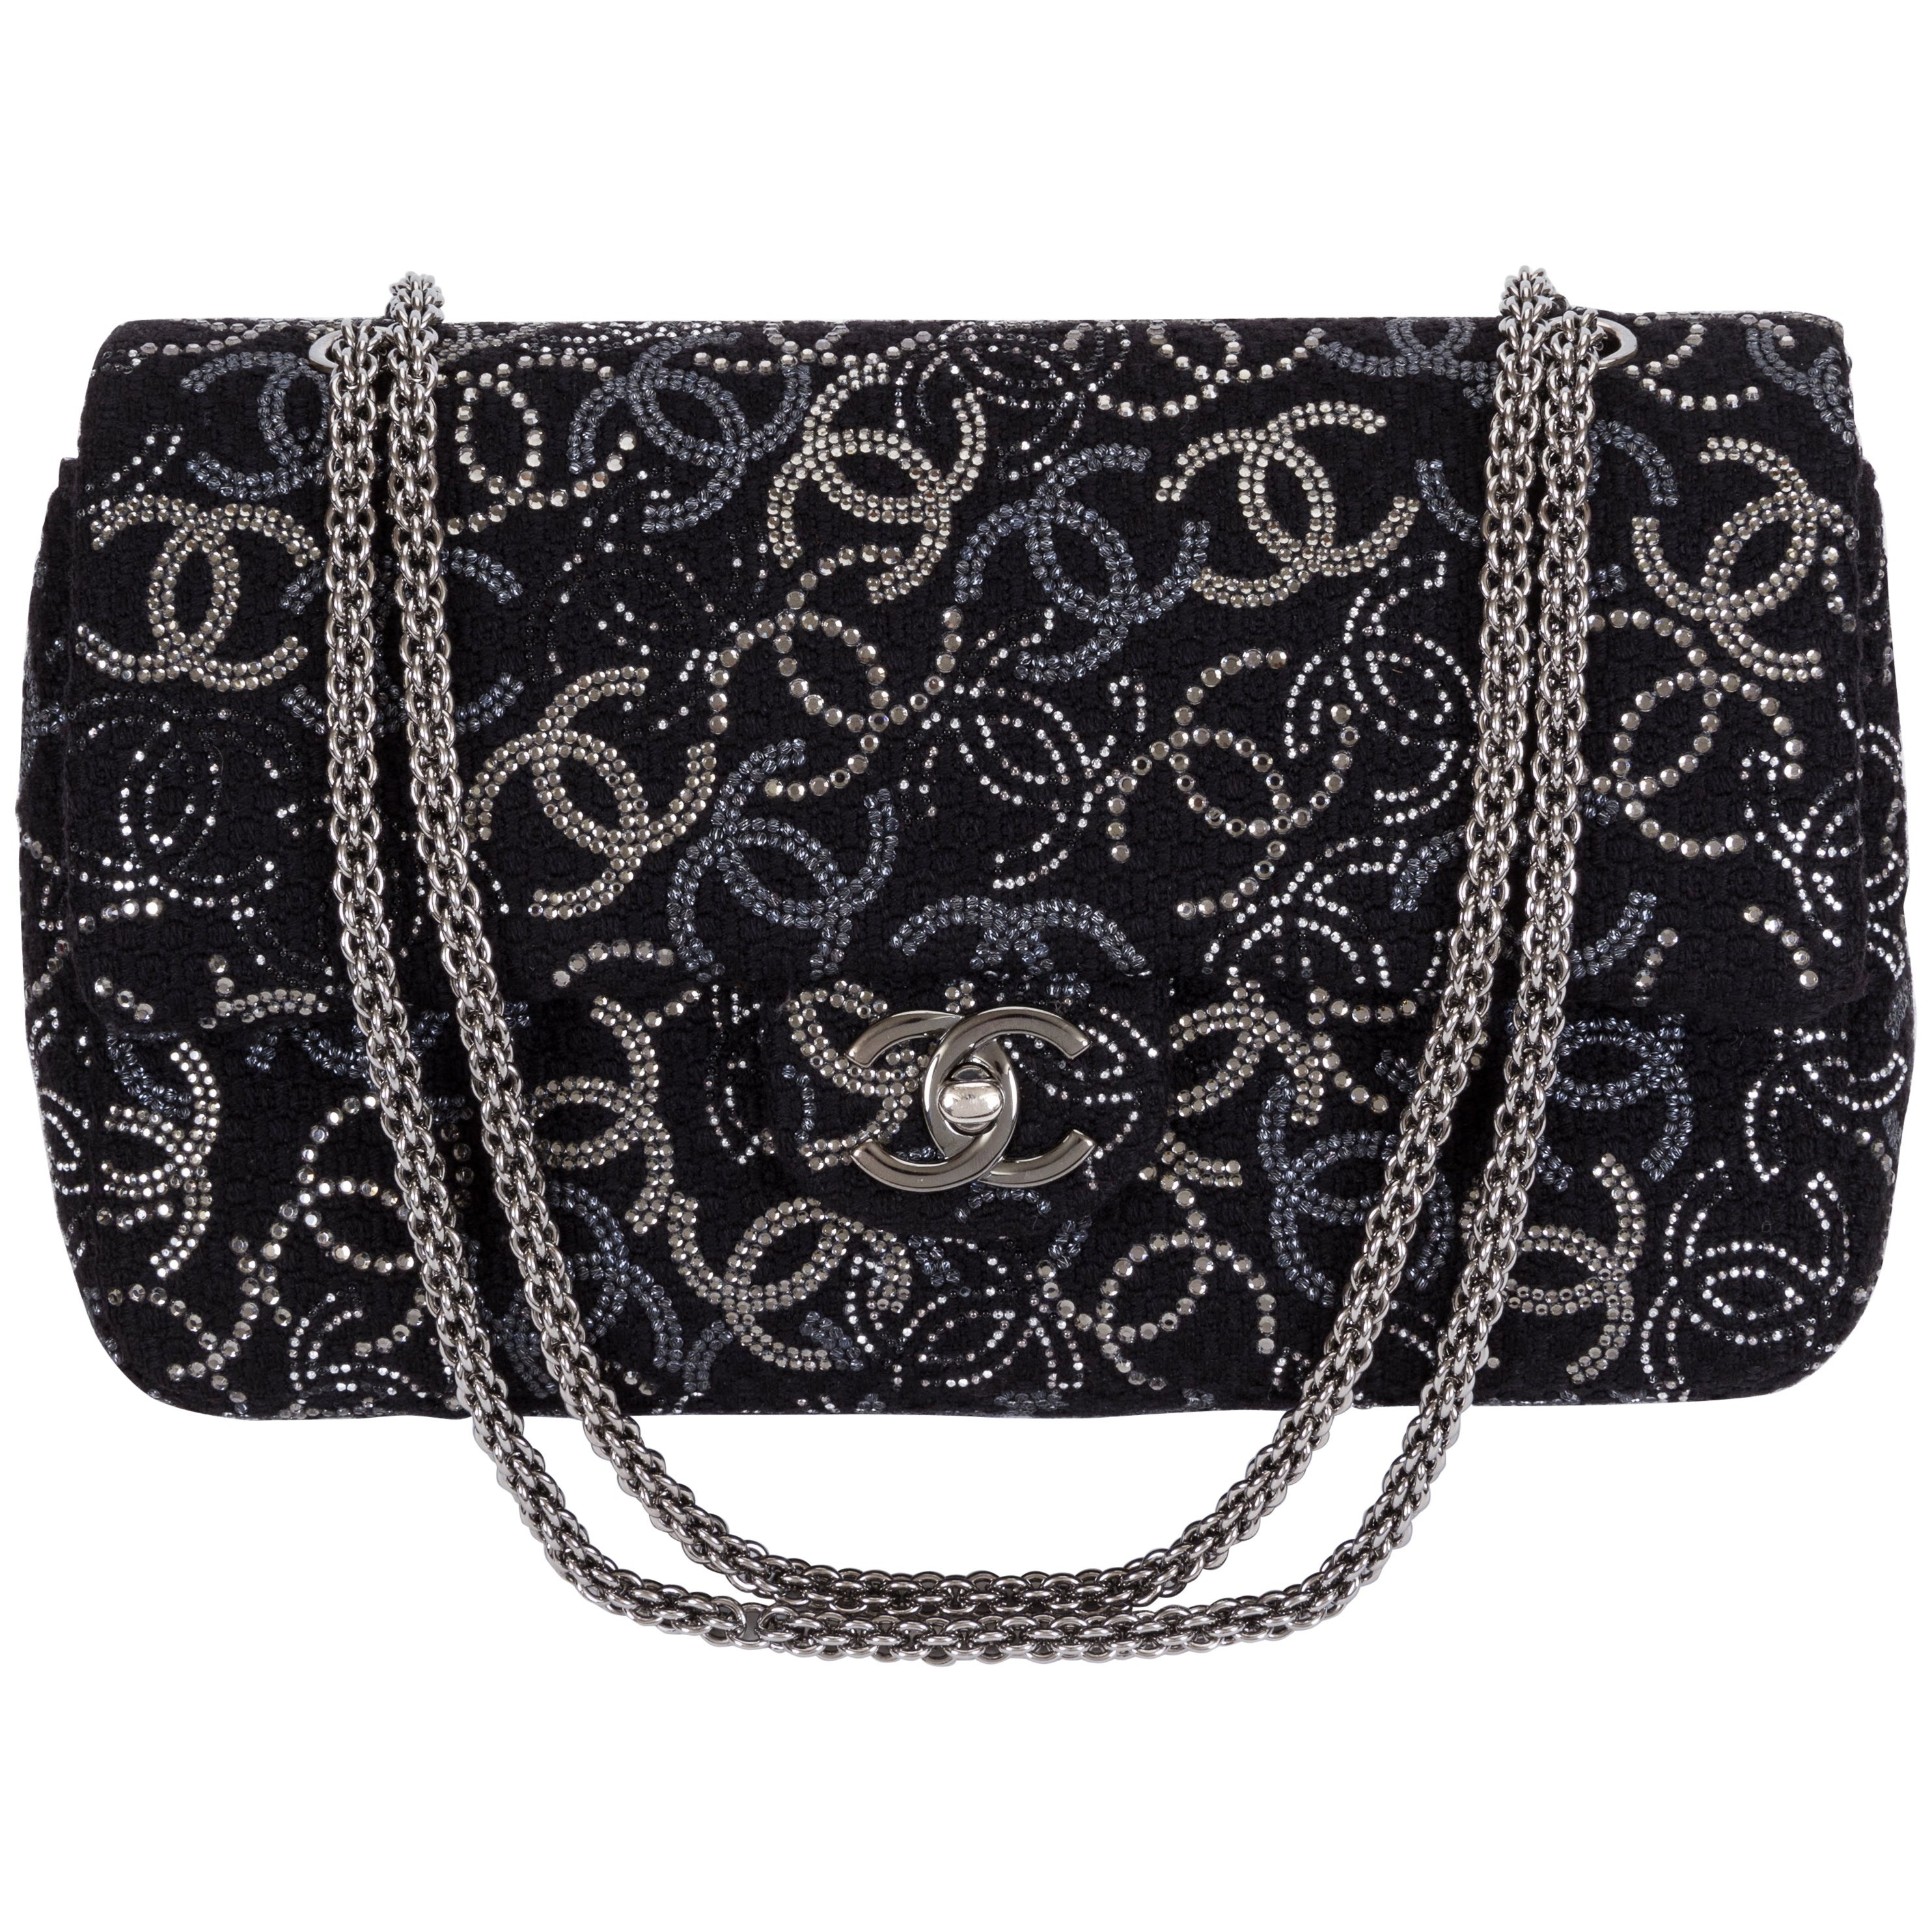 New Chanel Rhinestone CC Logo Double Flap Bag